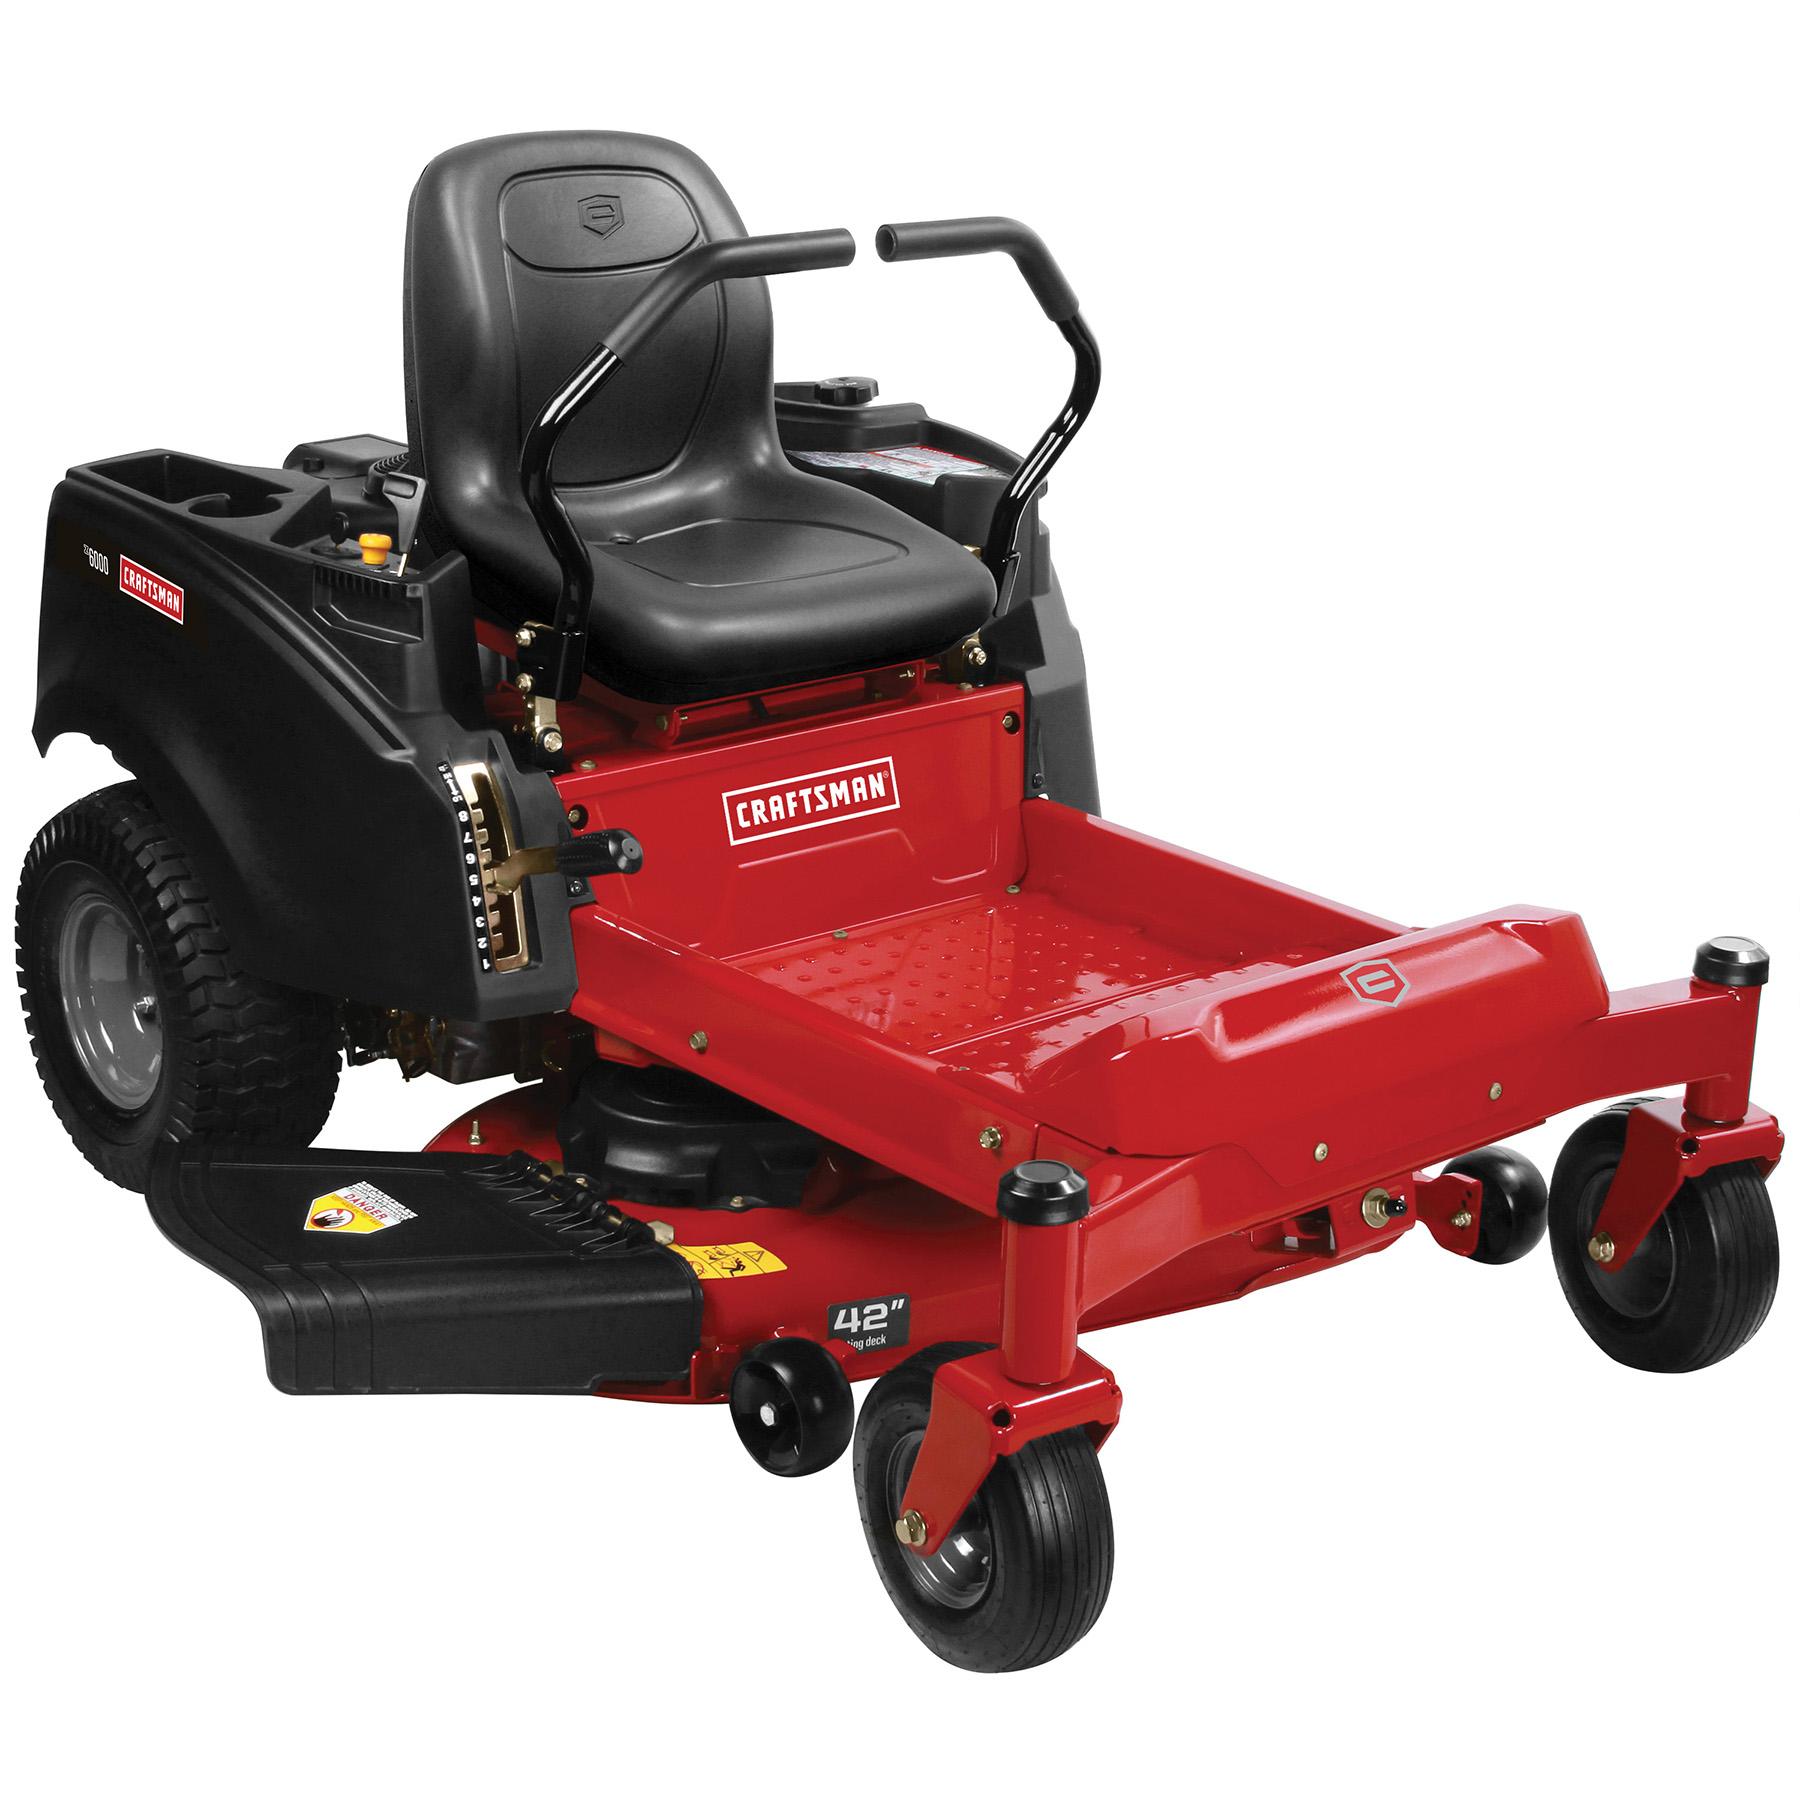 hight resolution of craftsman 20411 42 22 hp v twin briggs stratton zero turn riding mower